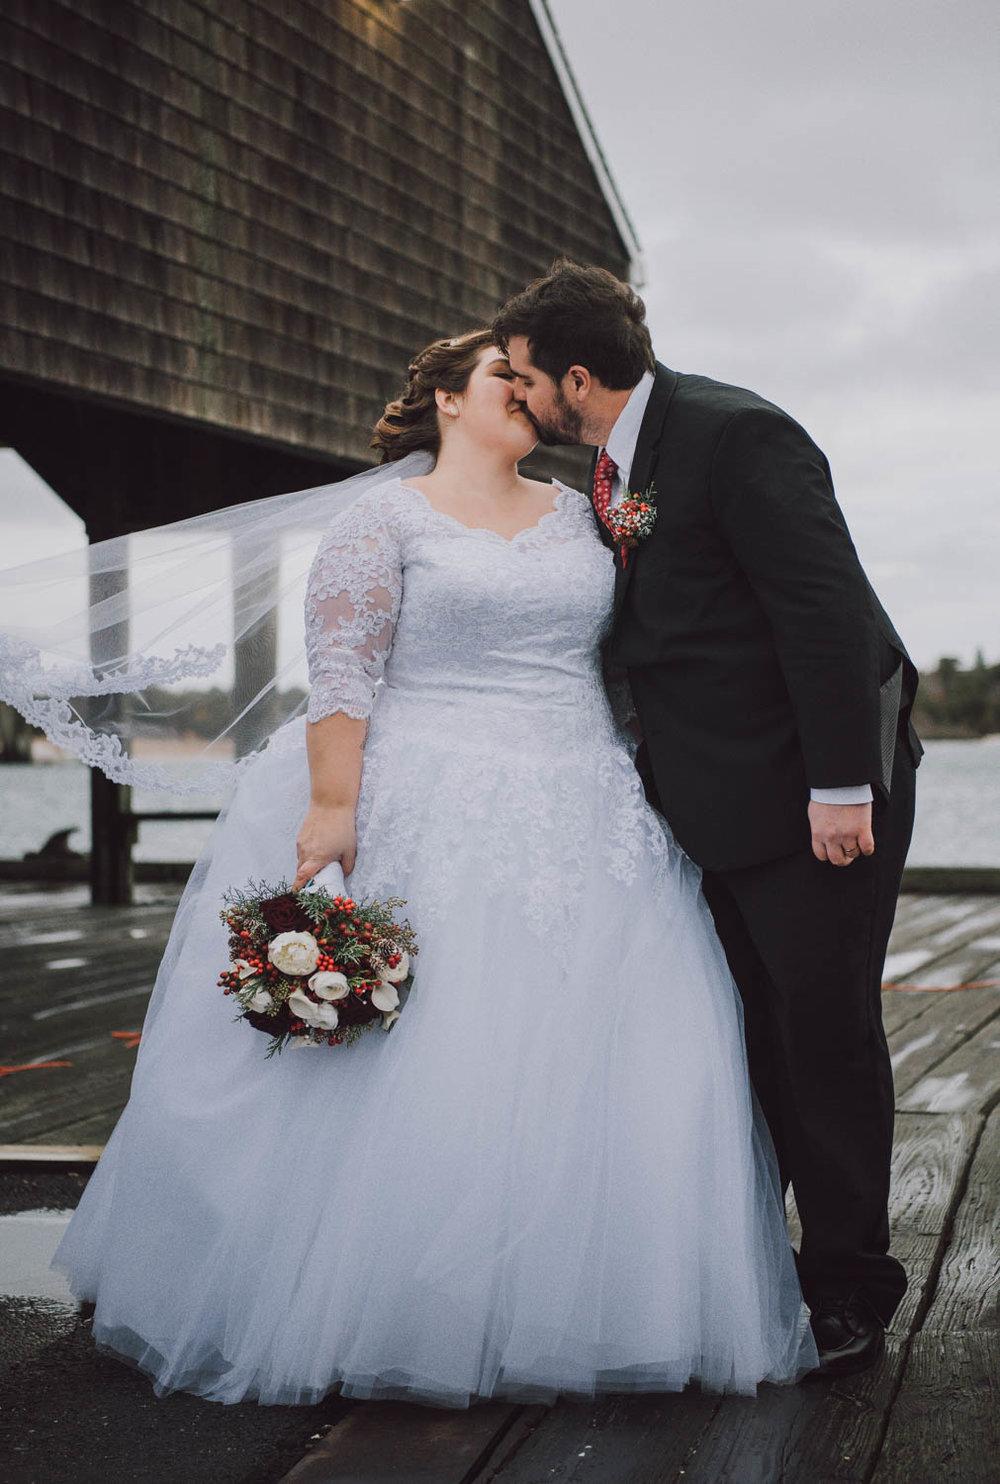 lauren-noah-couple-wedding-photography2.jpg